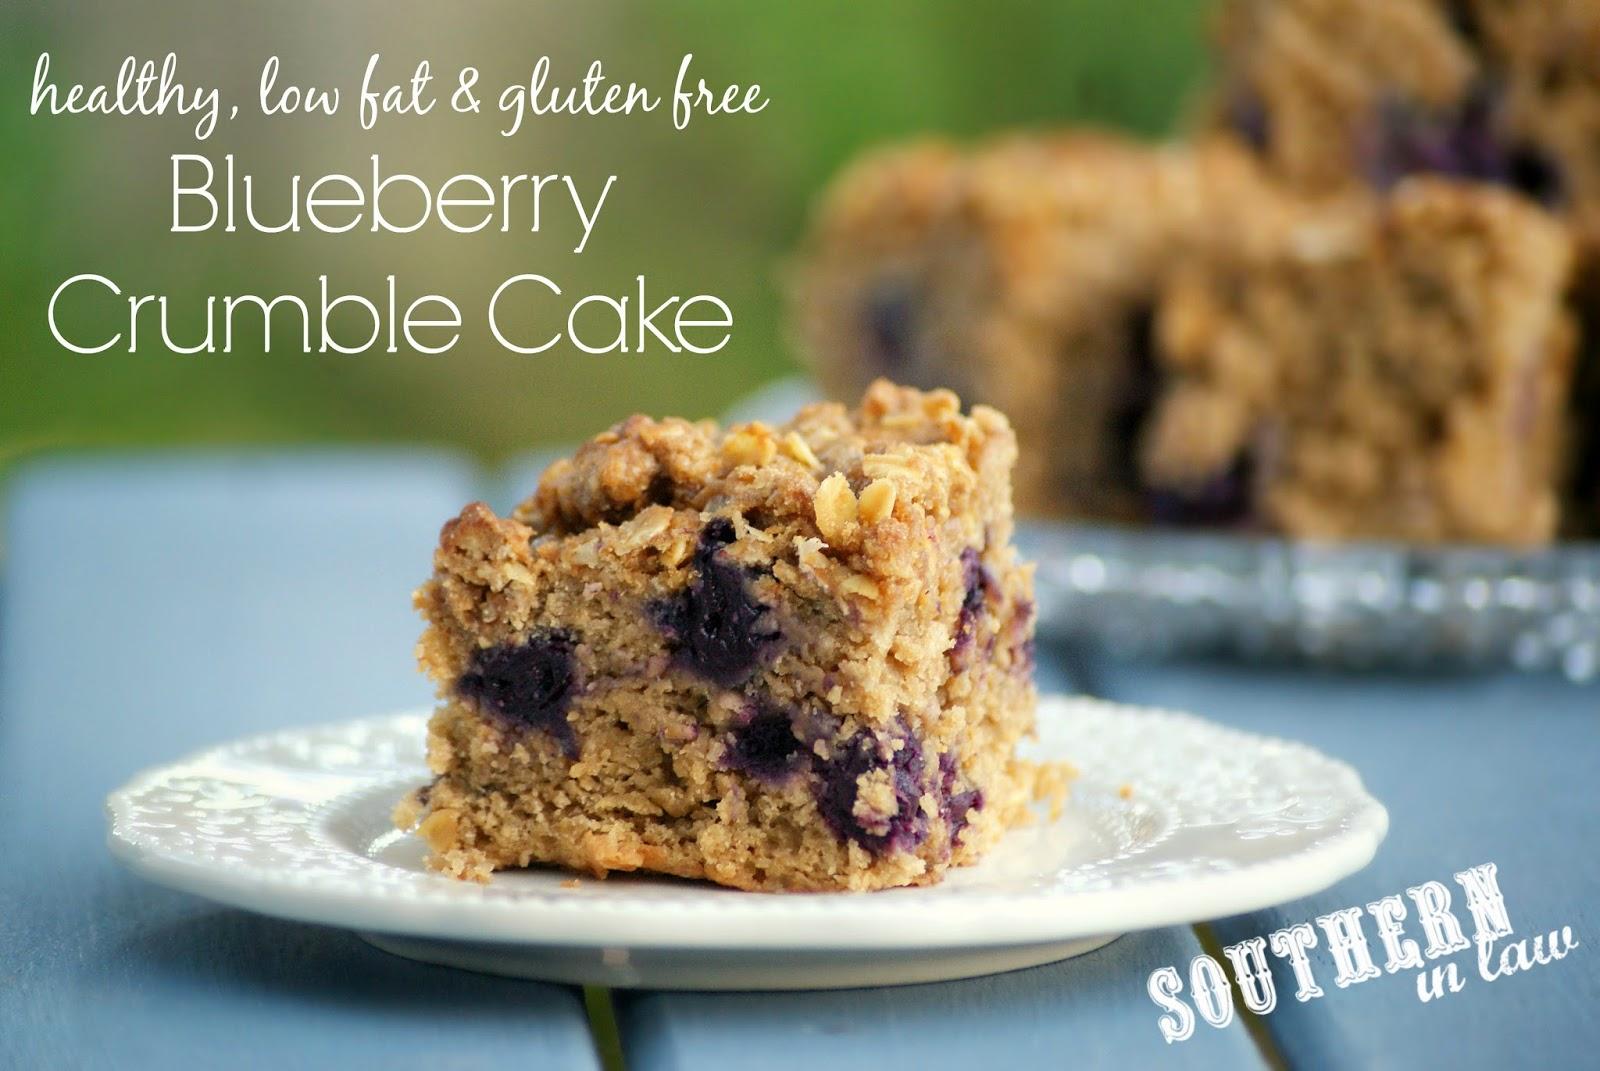 Gluten Free Blueberry Crumble Cake Recipe - gluten free, low fat ...